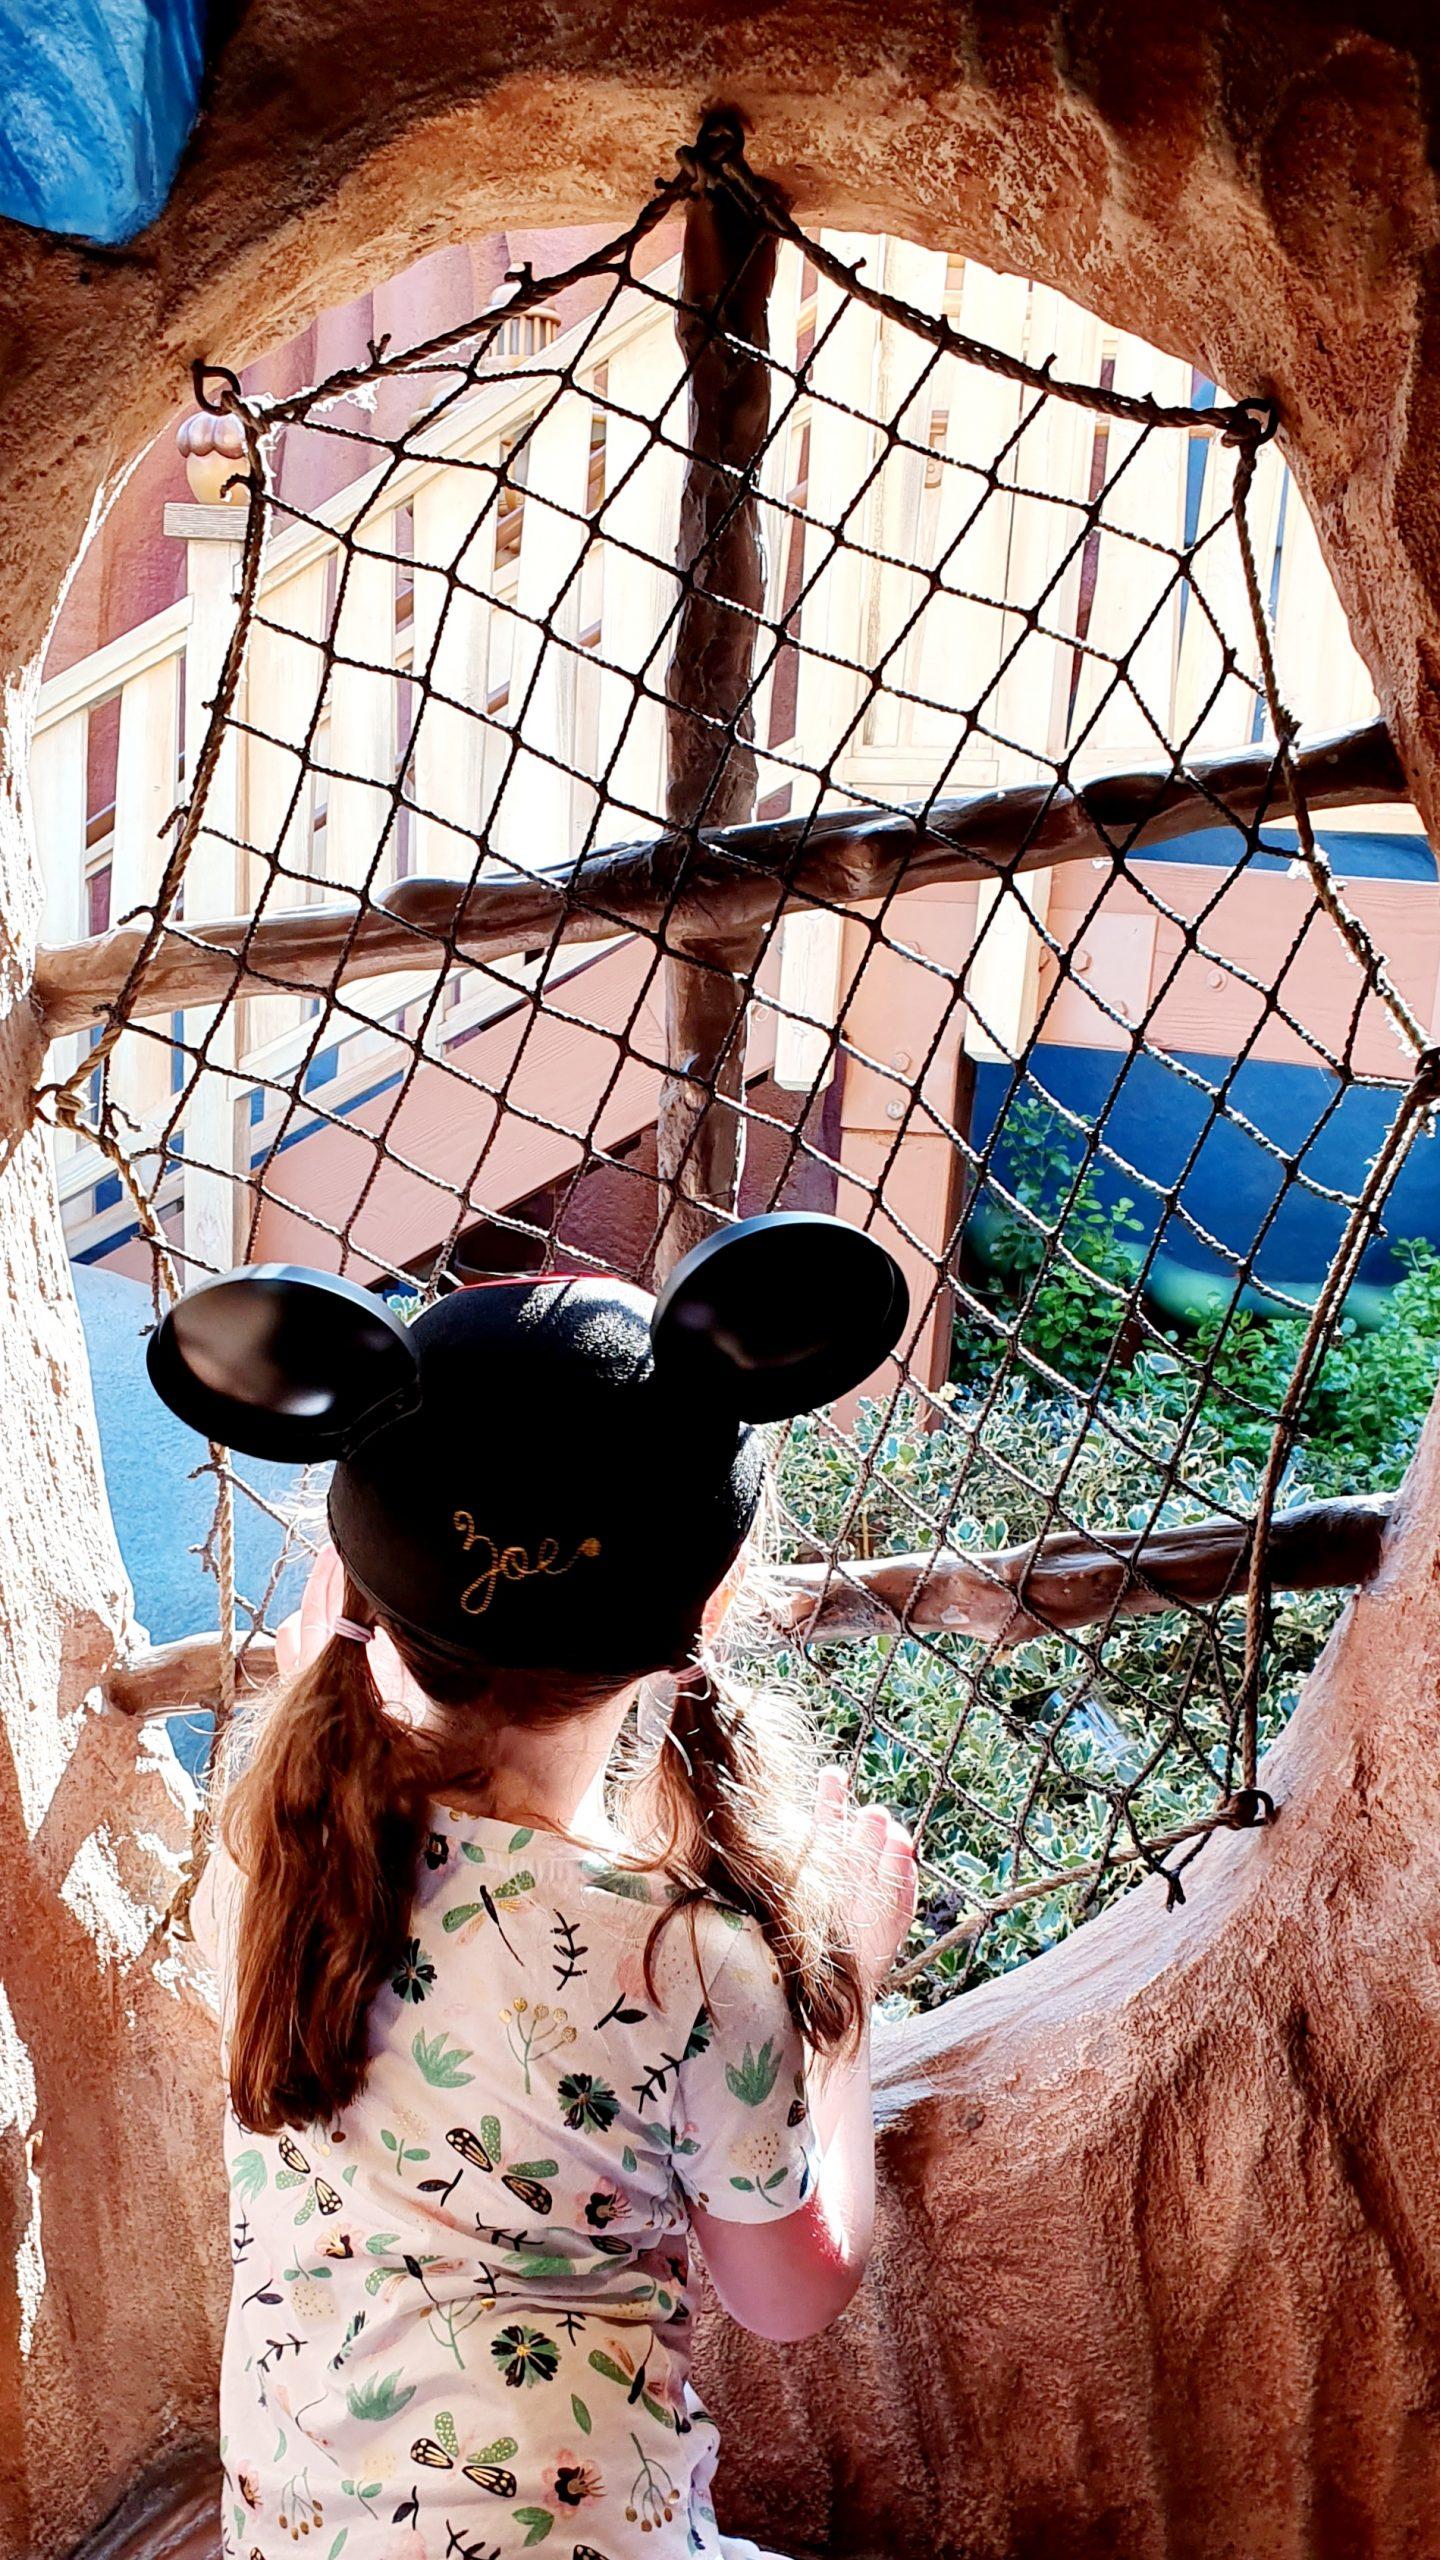 Disneyland Mickey's Toontown Chip n' Dale Treehouse